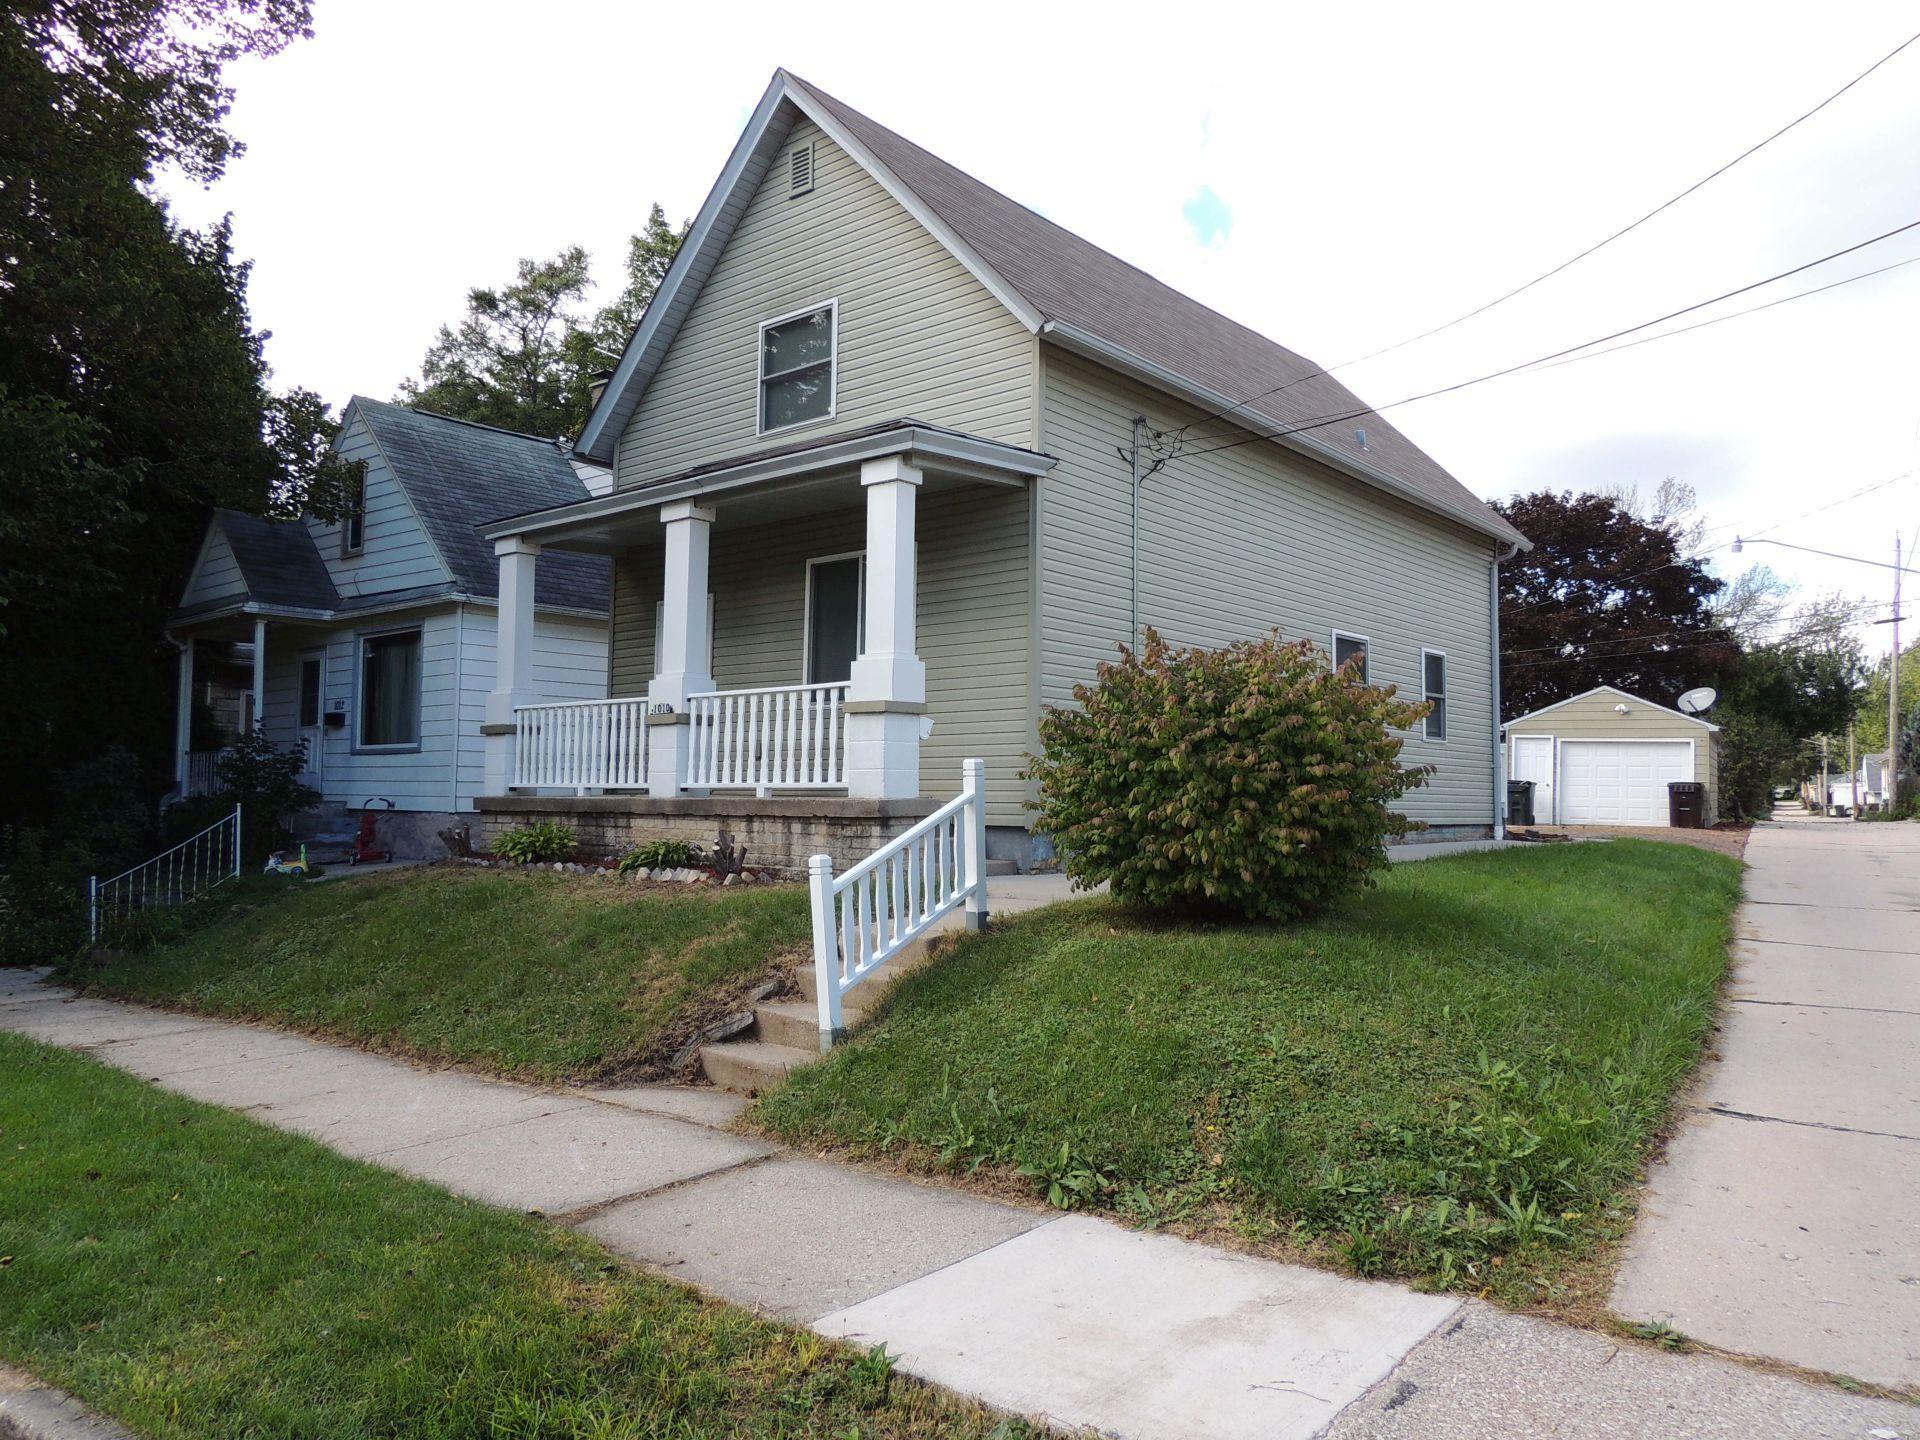 1010 Oak St South Milwaukee 53172 Sold Listing Mls